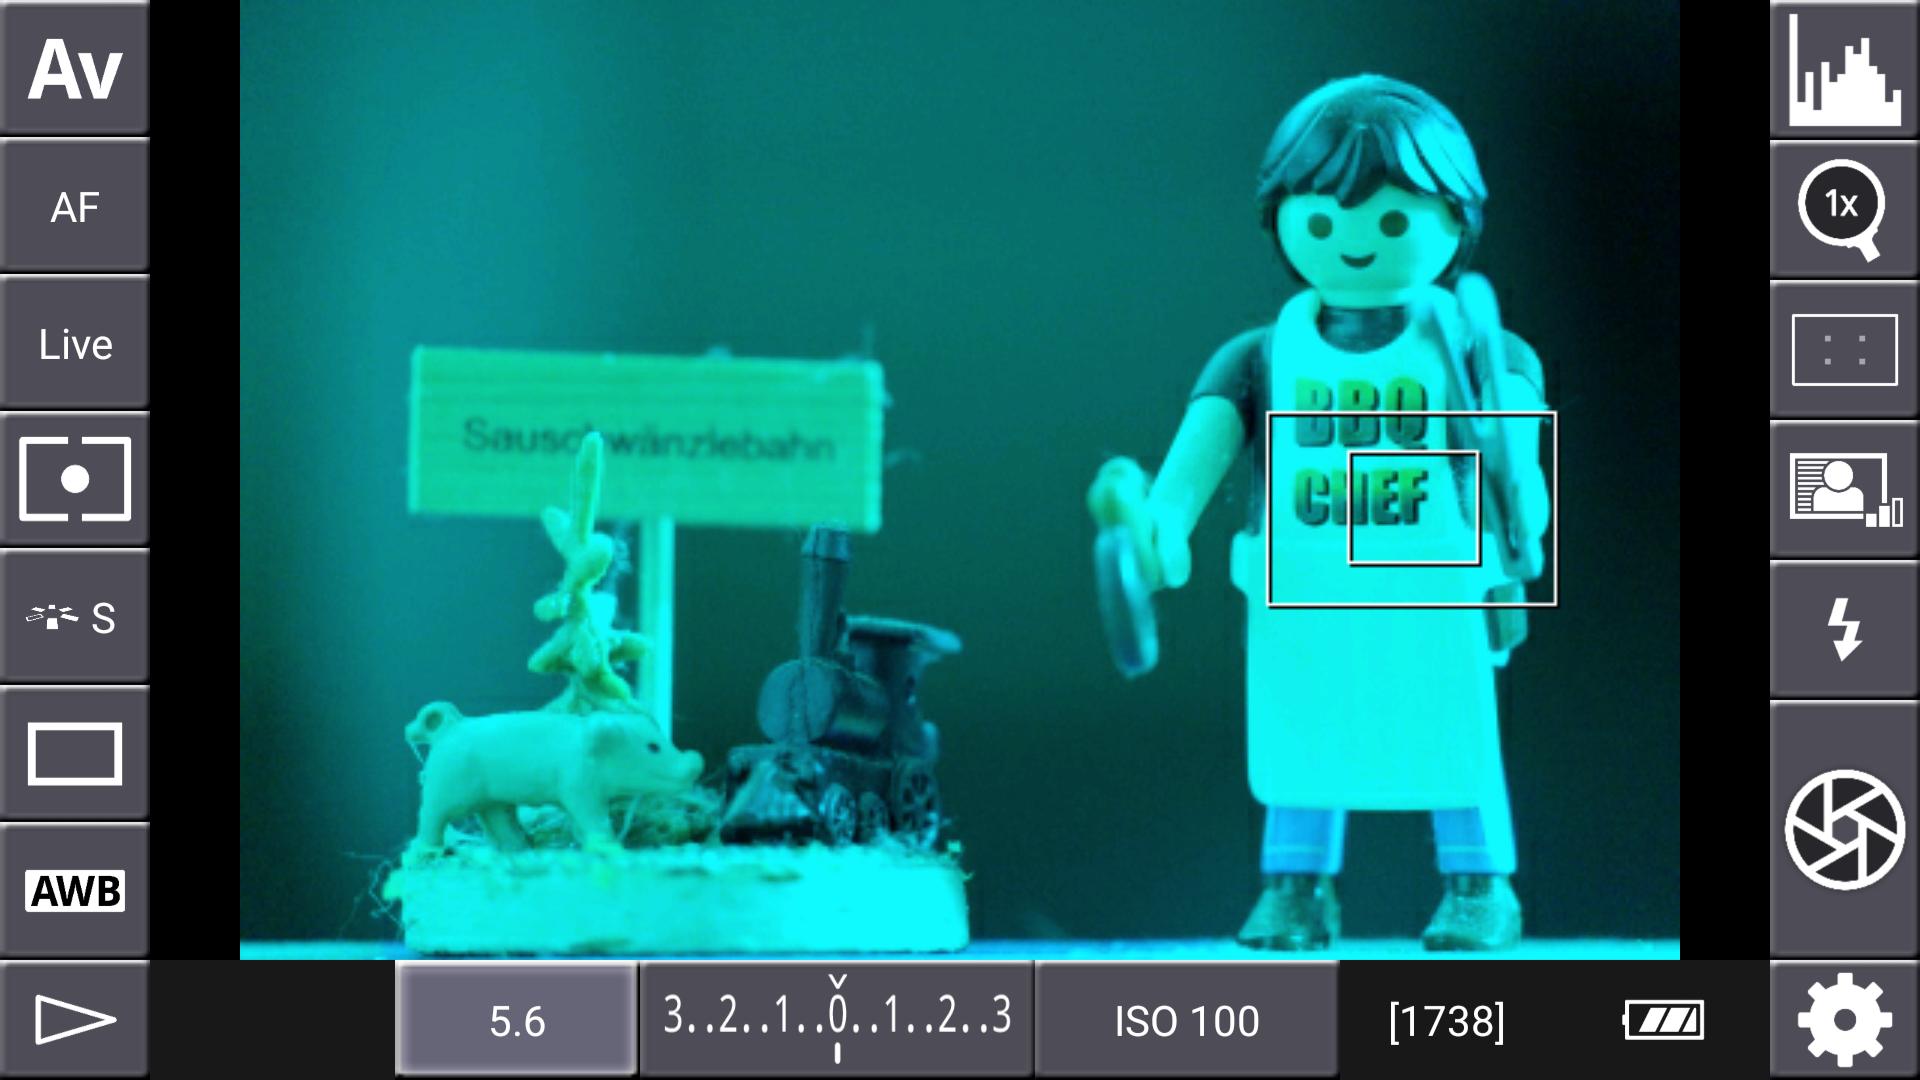 DSLR-Controller Anleitung - Display filter: Channel Mask (Grün + Blau)